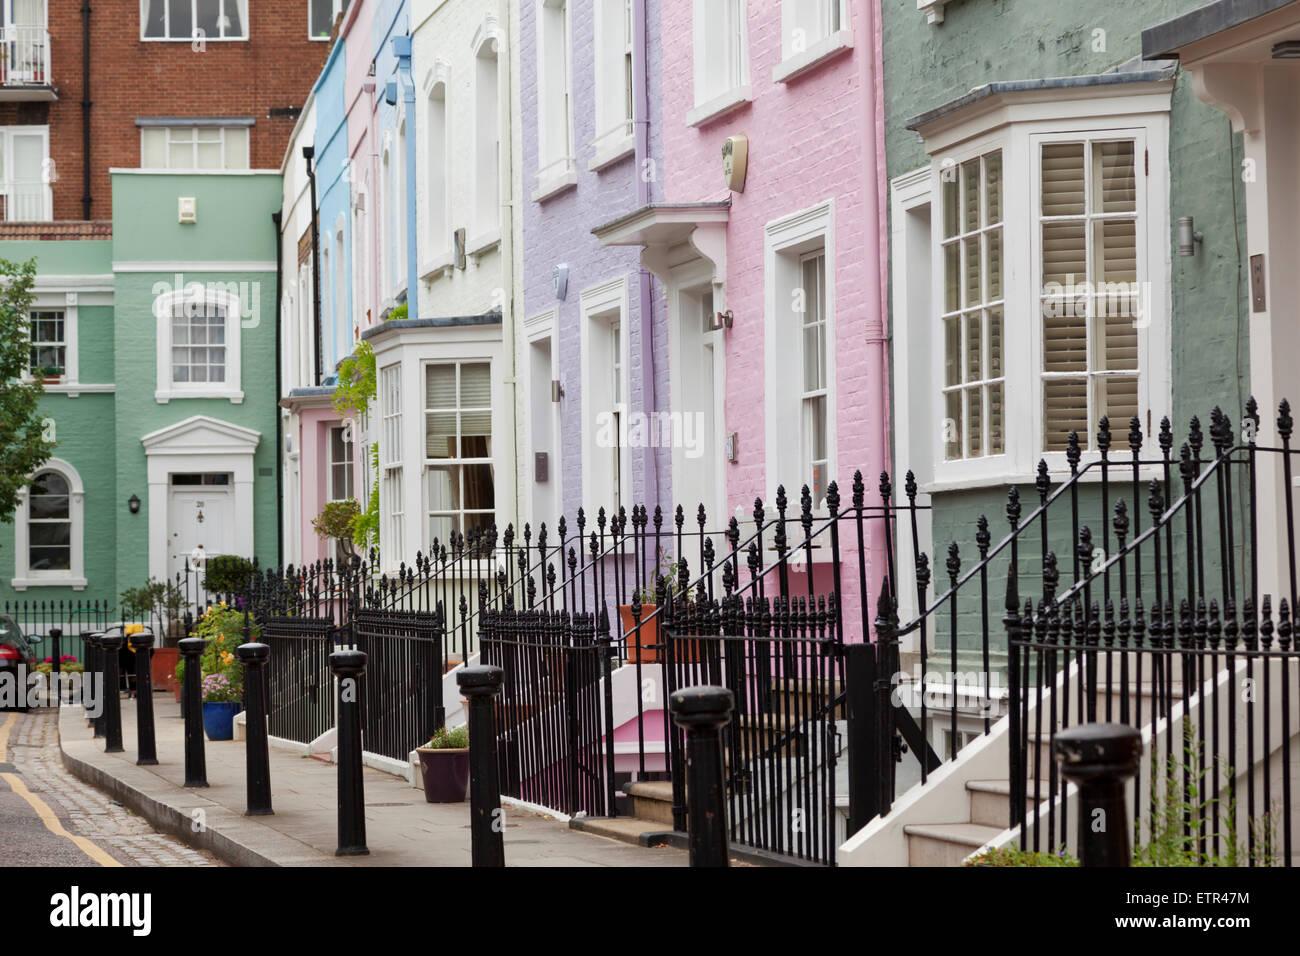 Upmarket street in Chelsea, London - Stock Image